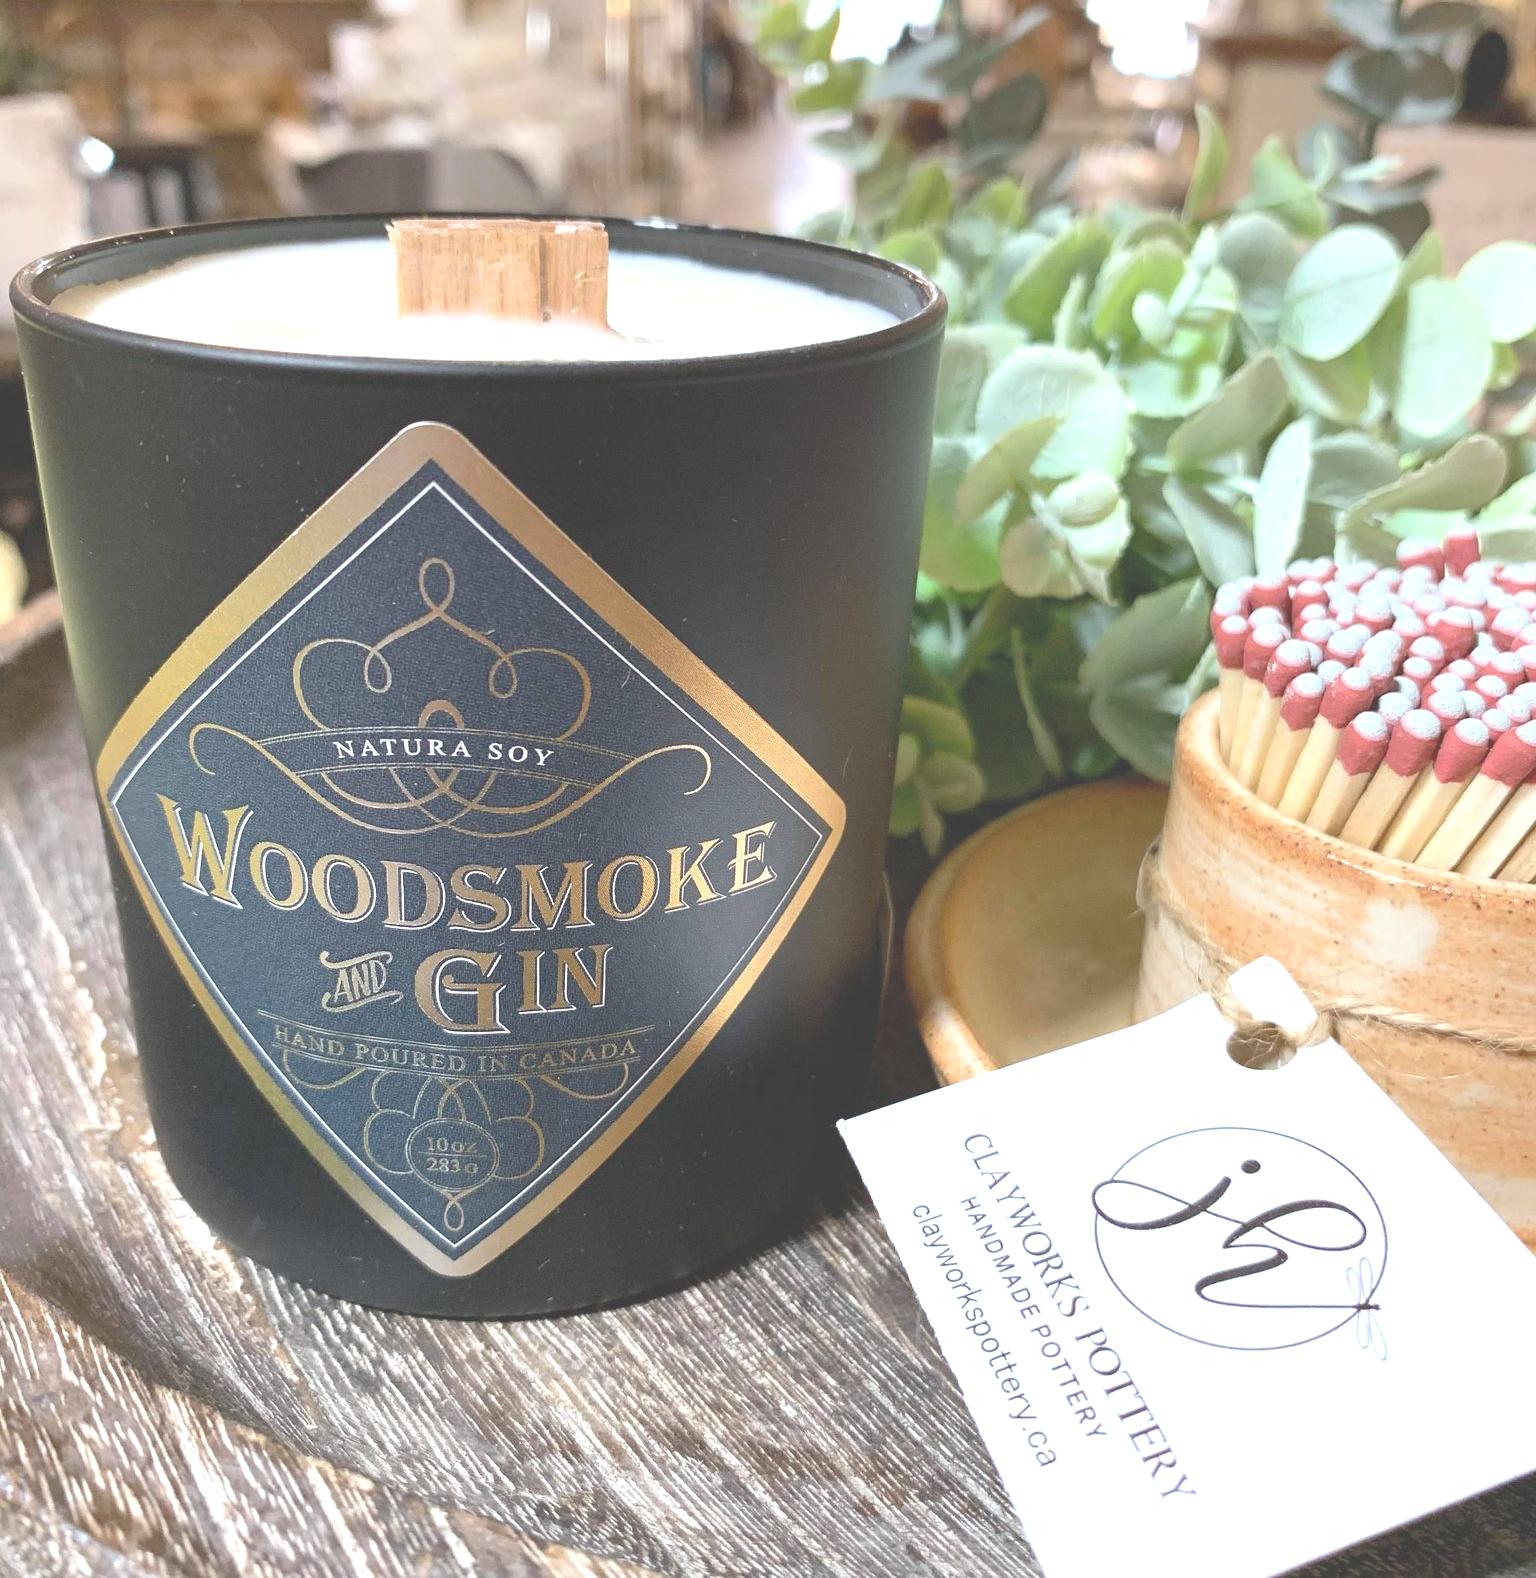 Woodsmoke & Gin Balsam Fir, Spruce and Pine balanced with Mint, Eucalyptus and Juniper Berry.